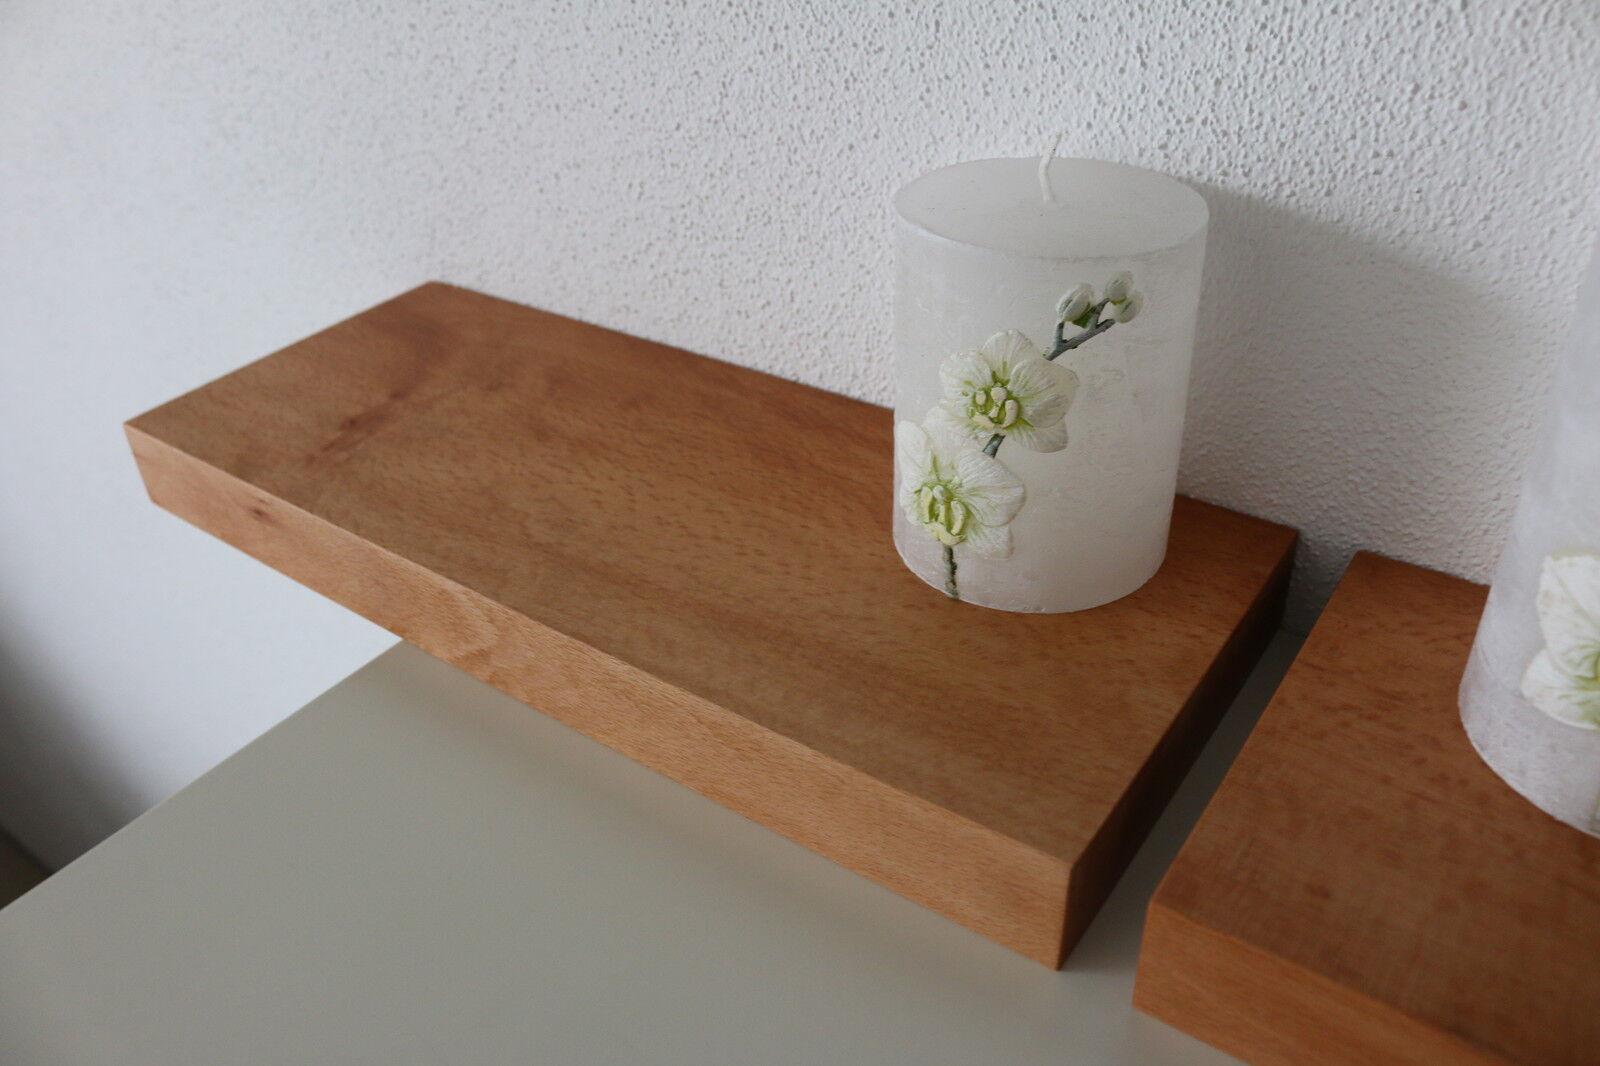 2x wandboard buche massiv holz board regal steckboard regalbrett neu auf ma eur 90 00. Black Bedroom Furniture Sets. Home Design Ideas